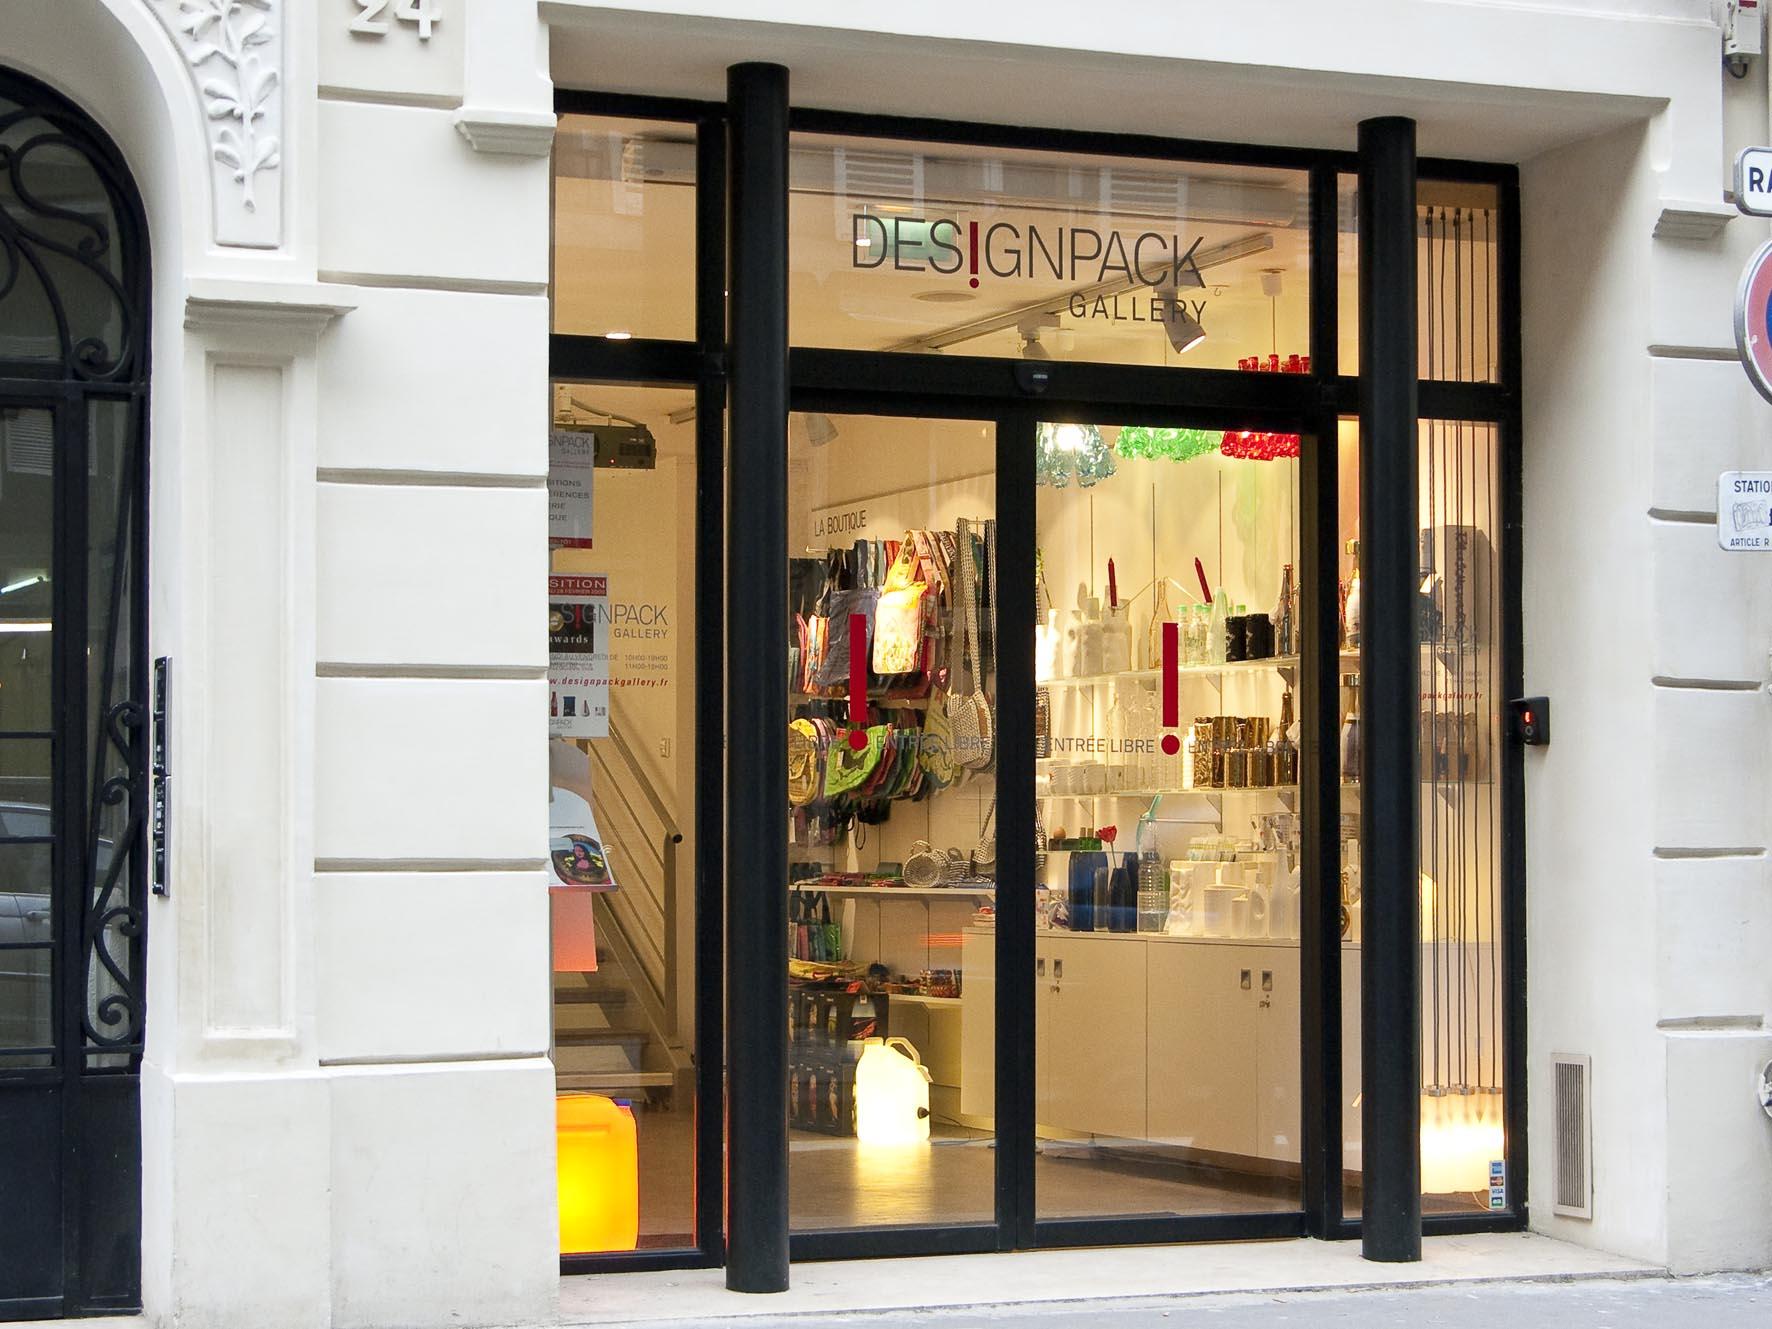 designpack gallery - Fabrice Peltier